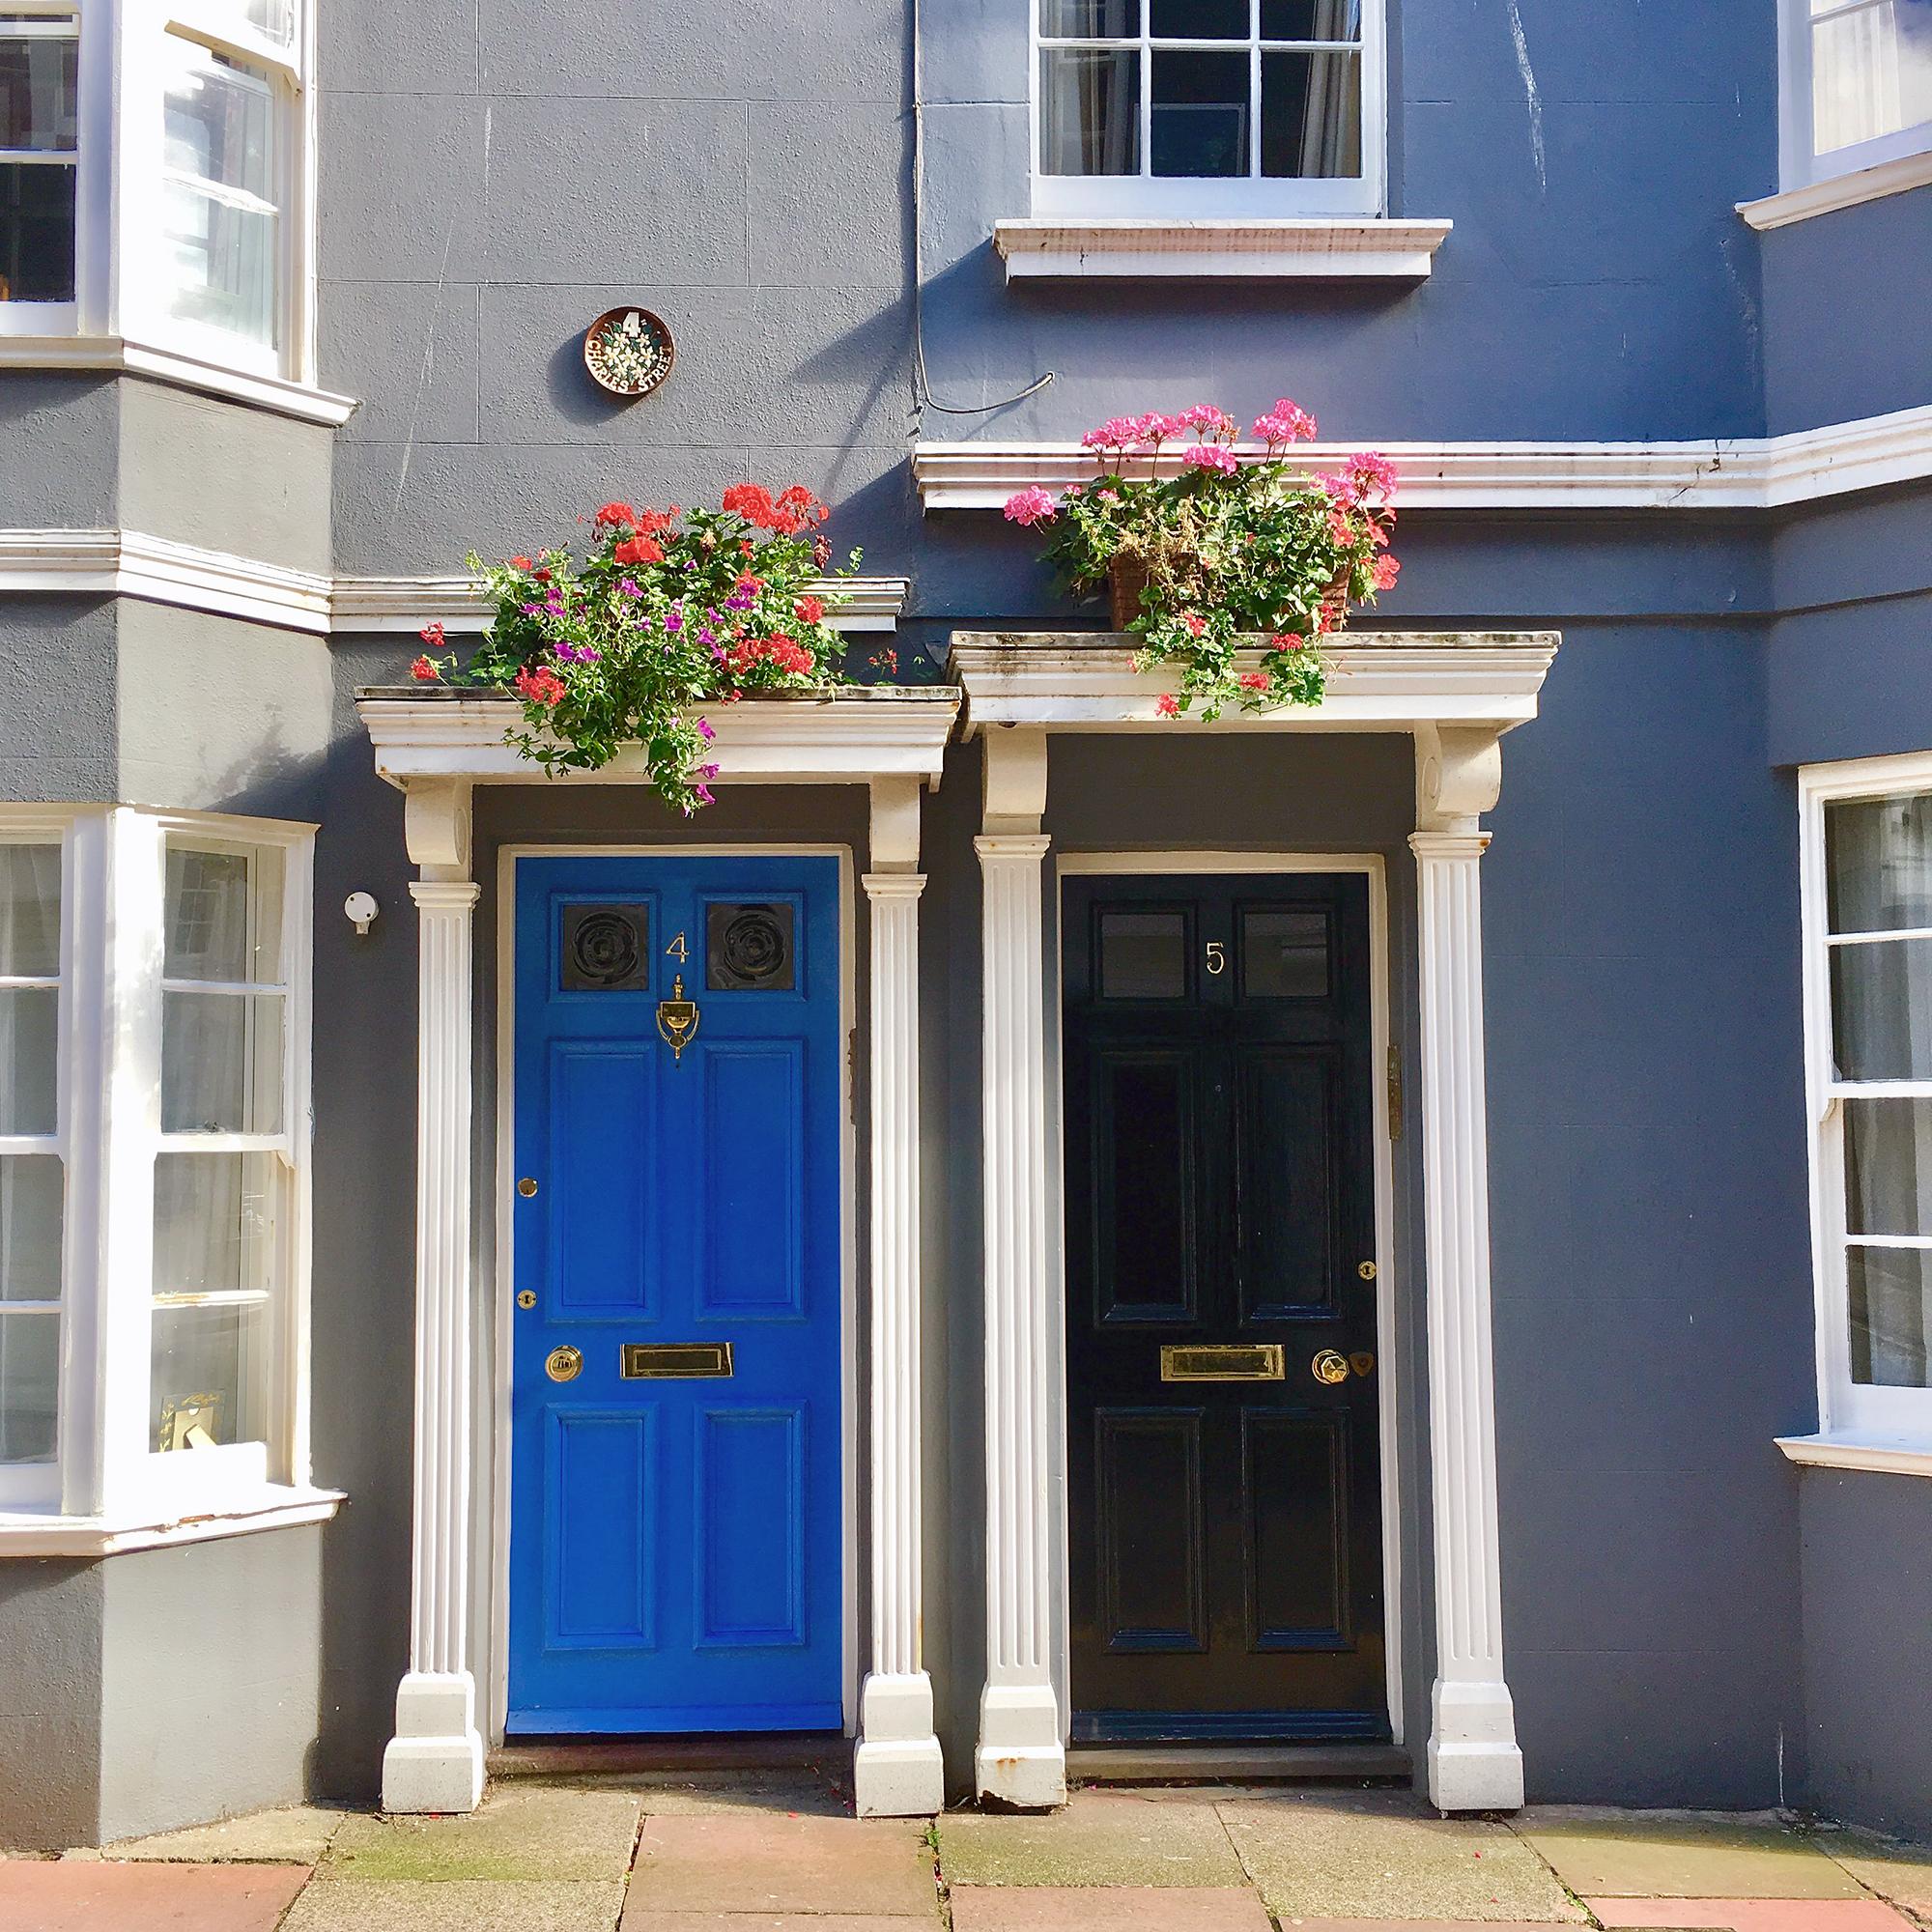 #doorsofinstagram: Brighton